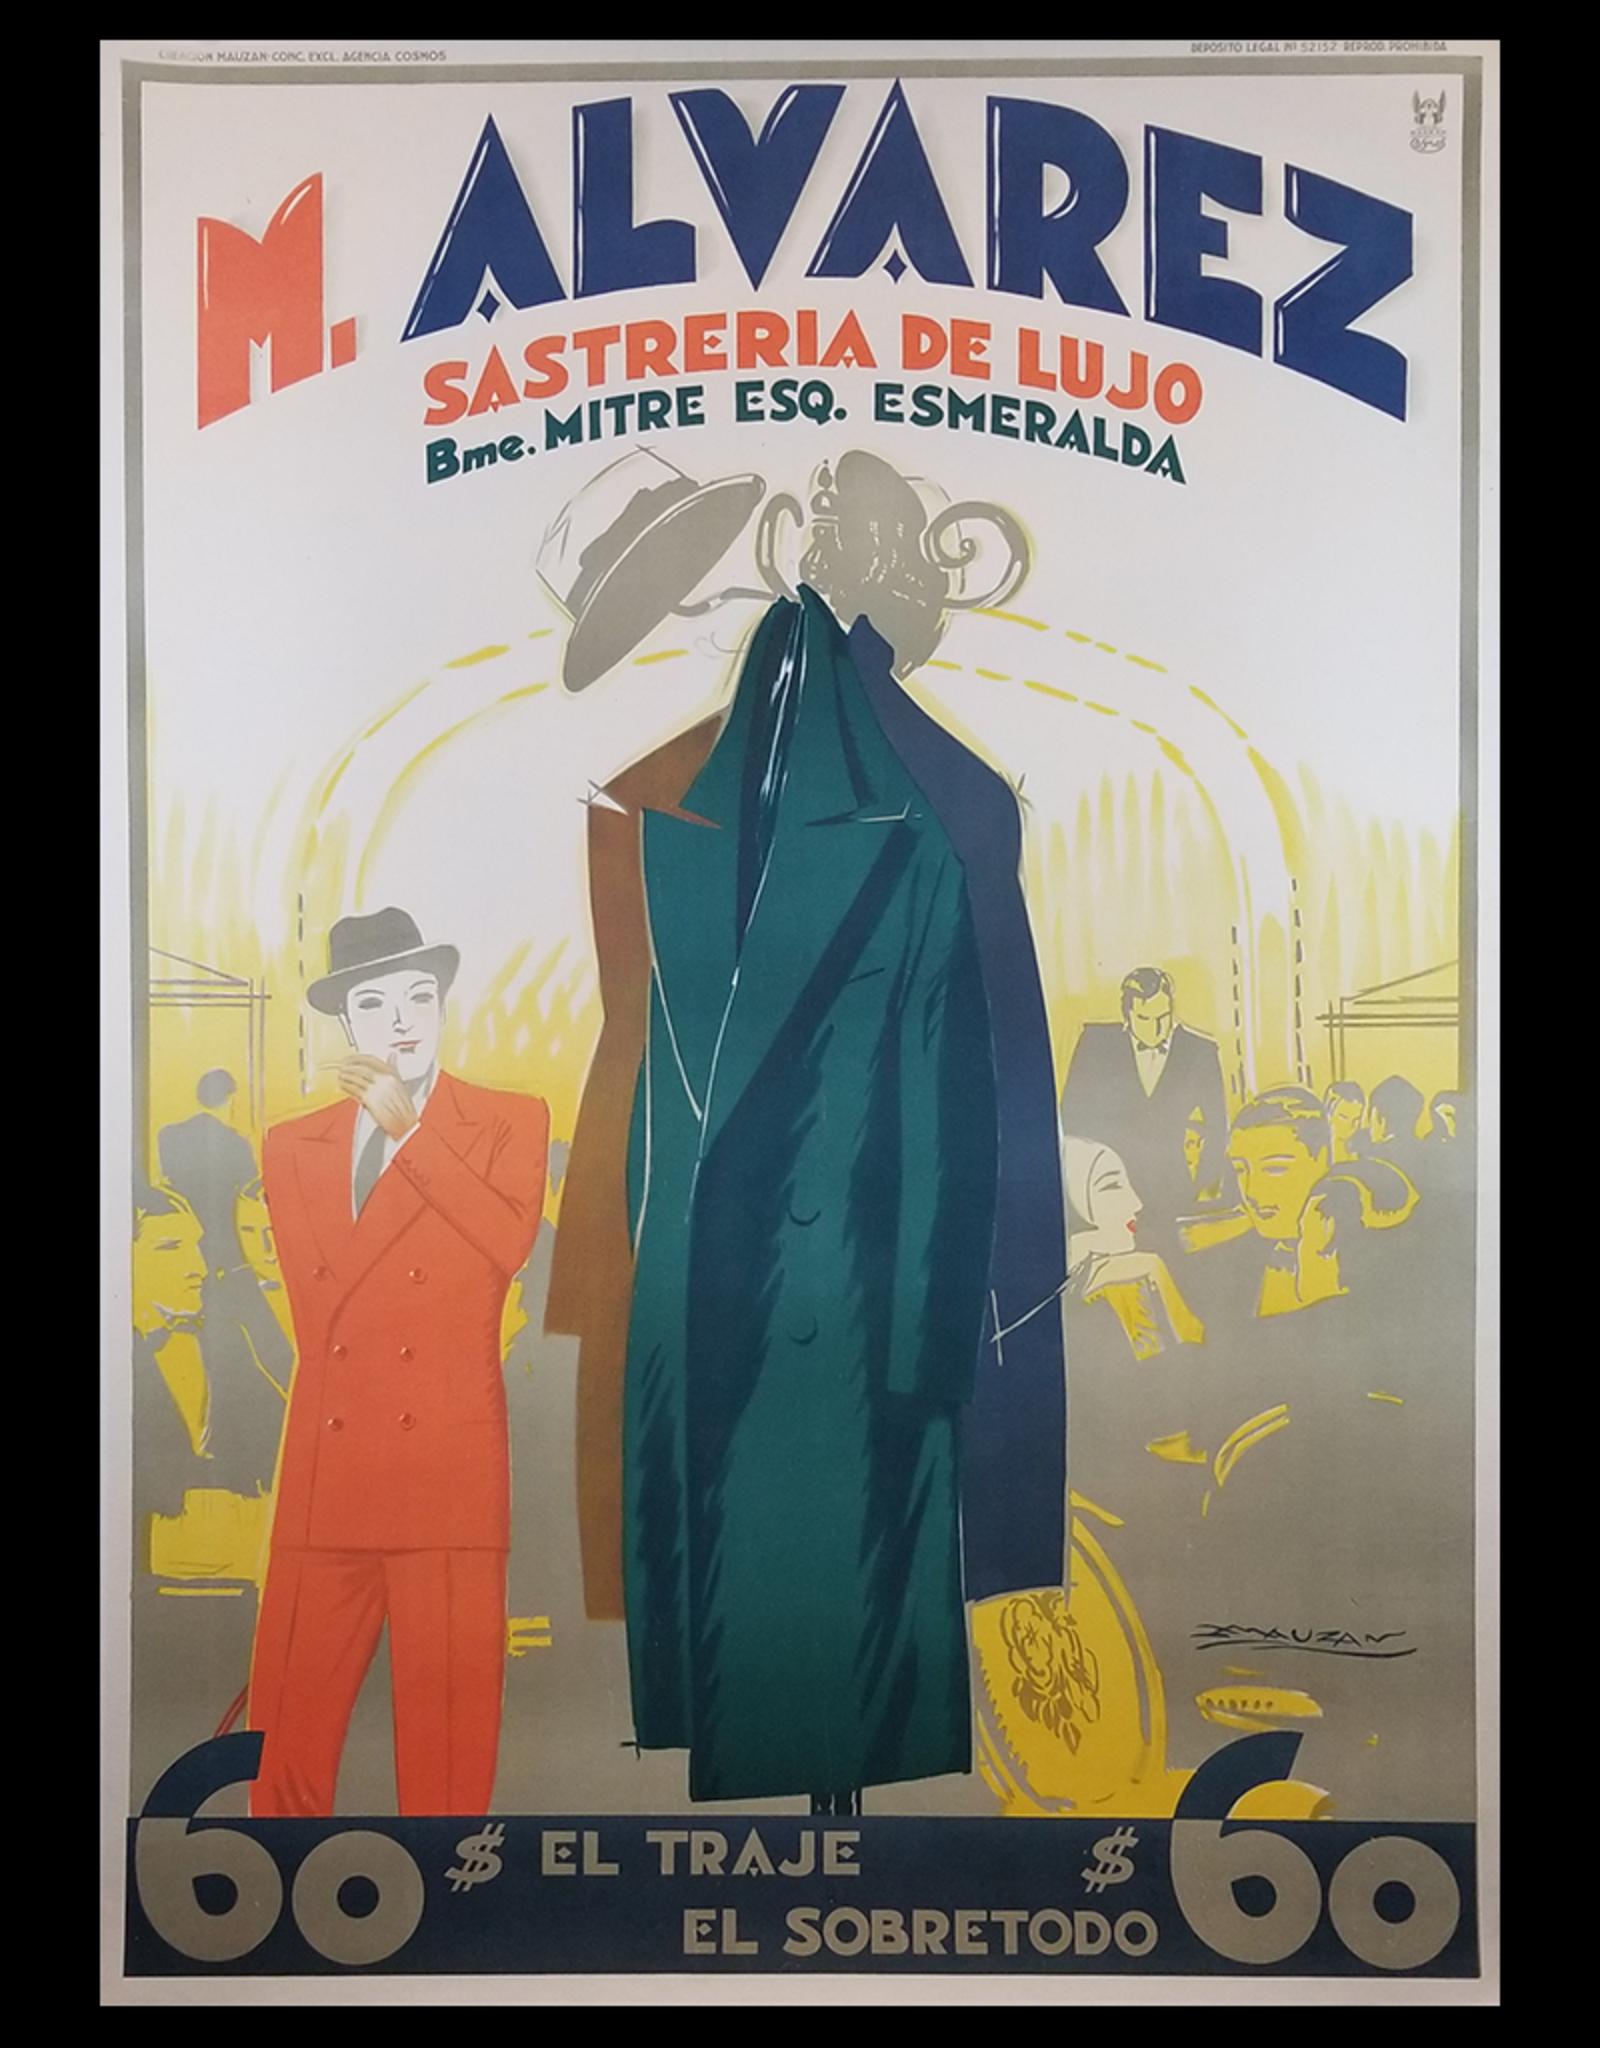 "SPV M Alverez Sasteria De Lujo """"Luxury Tailor Shop"" Lithograph Poster"